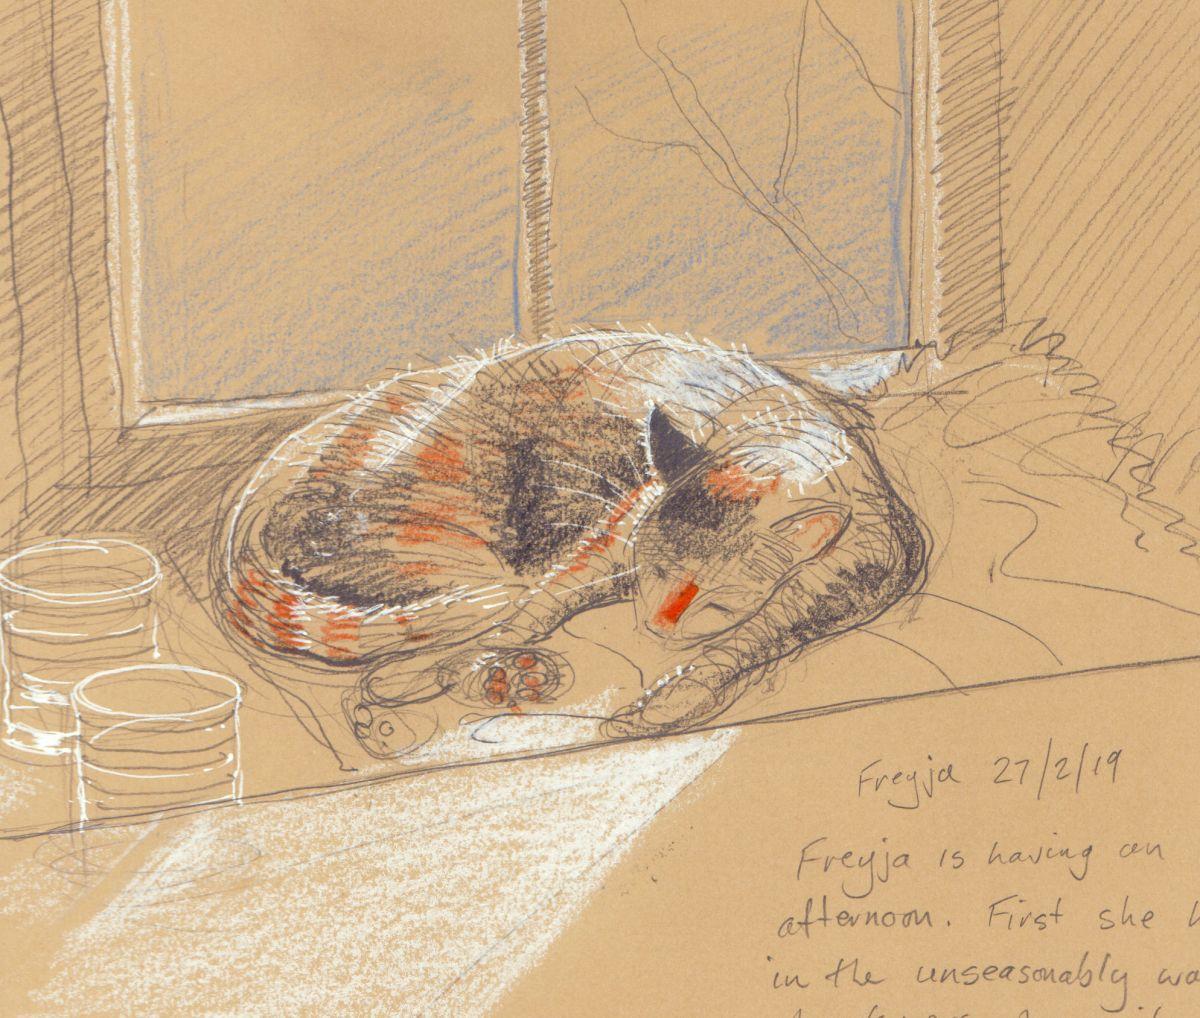 Freyja cat sketch